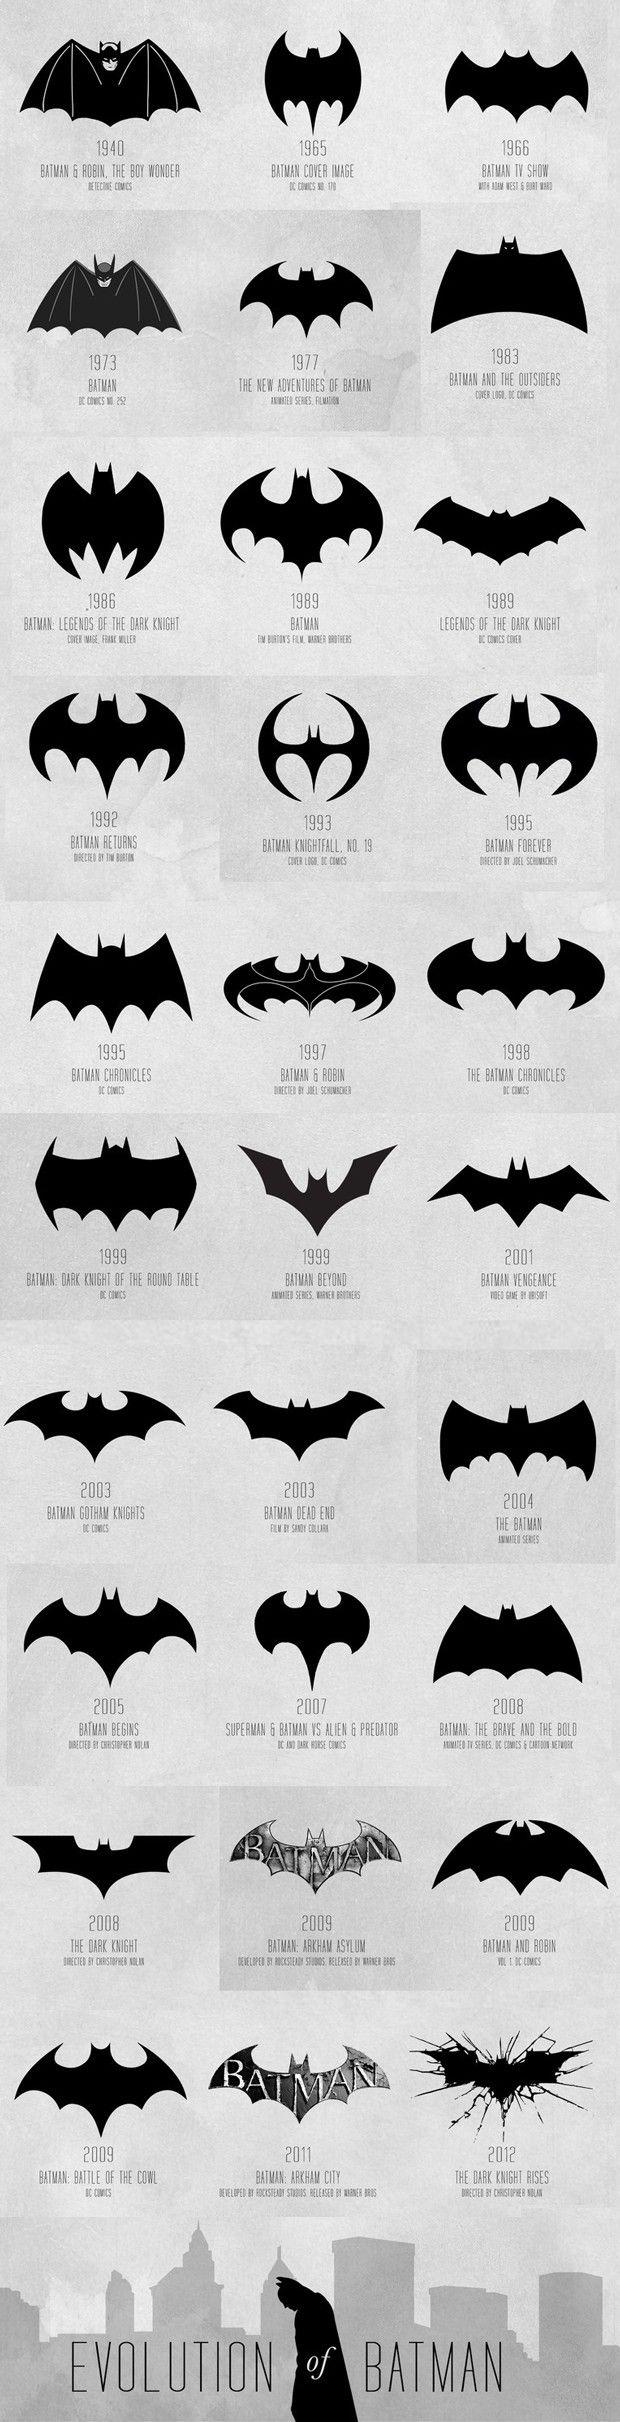 La evolución de los logos de Batman  Choosa.net                                                                                                                                                                                 Mais